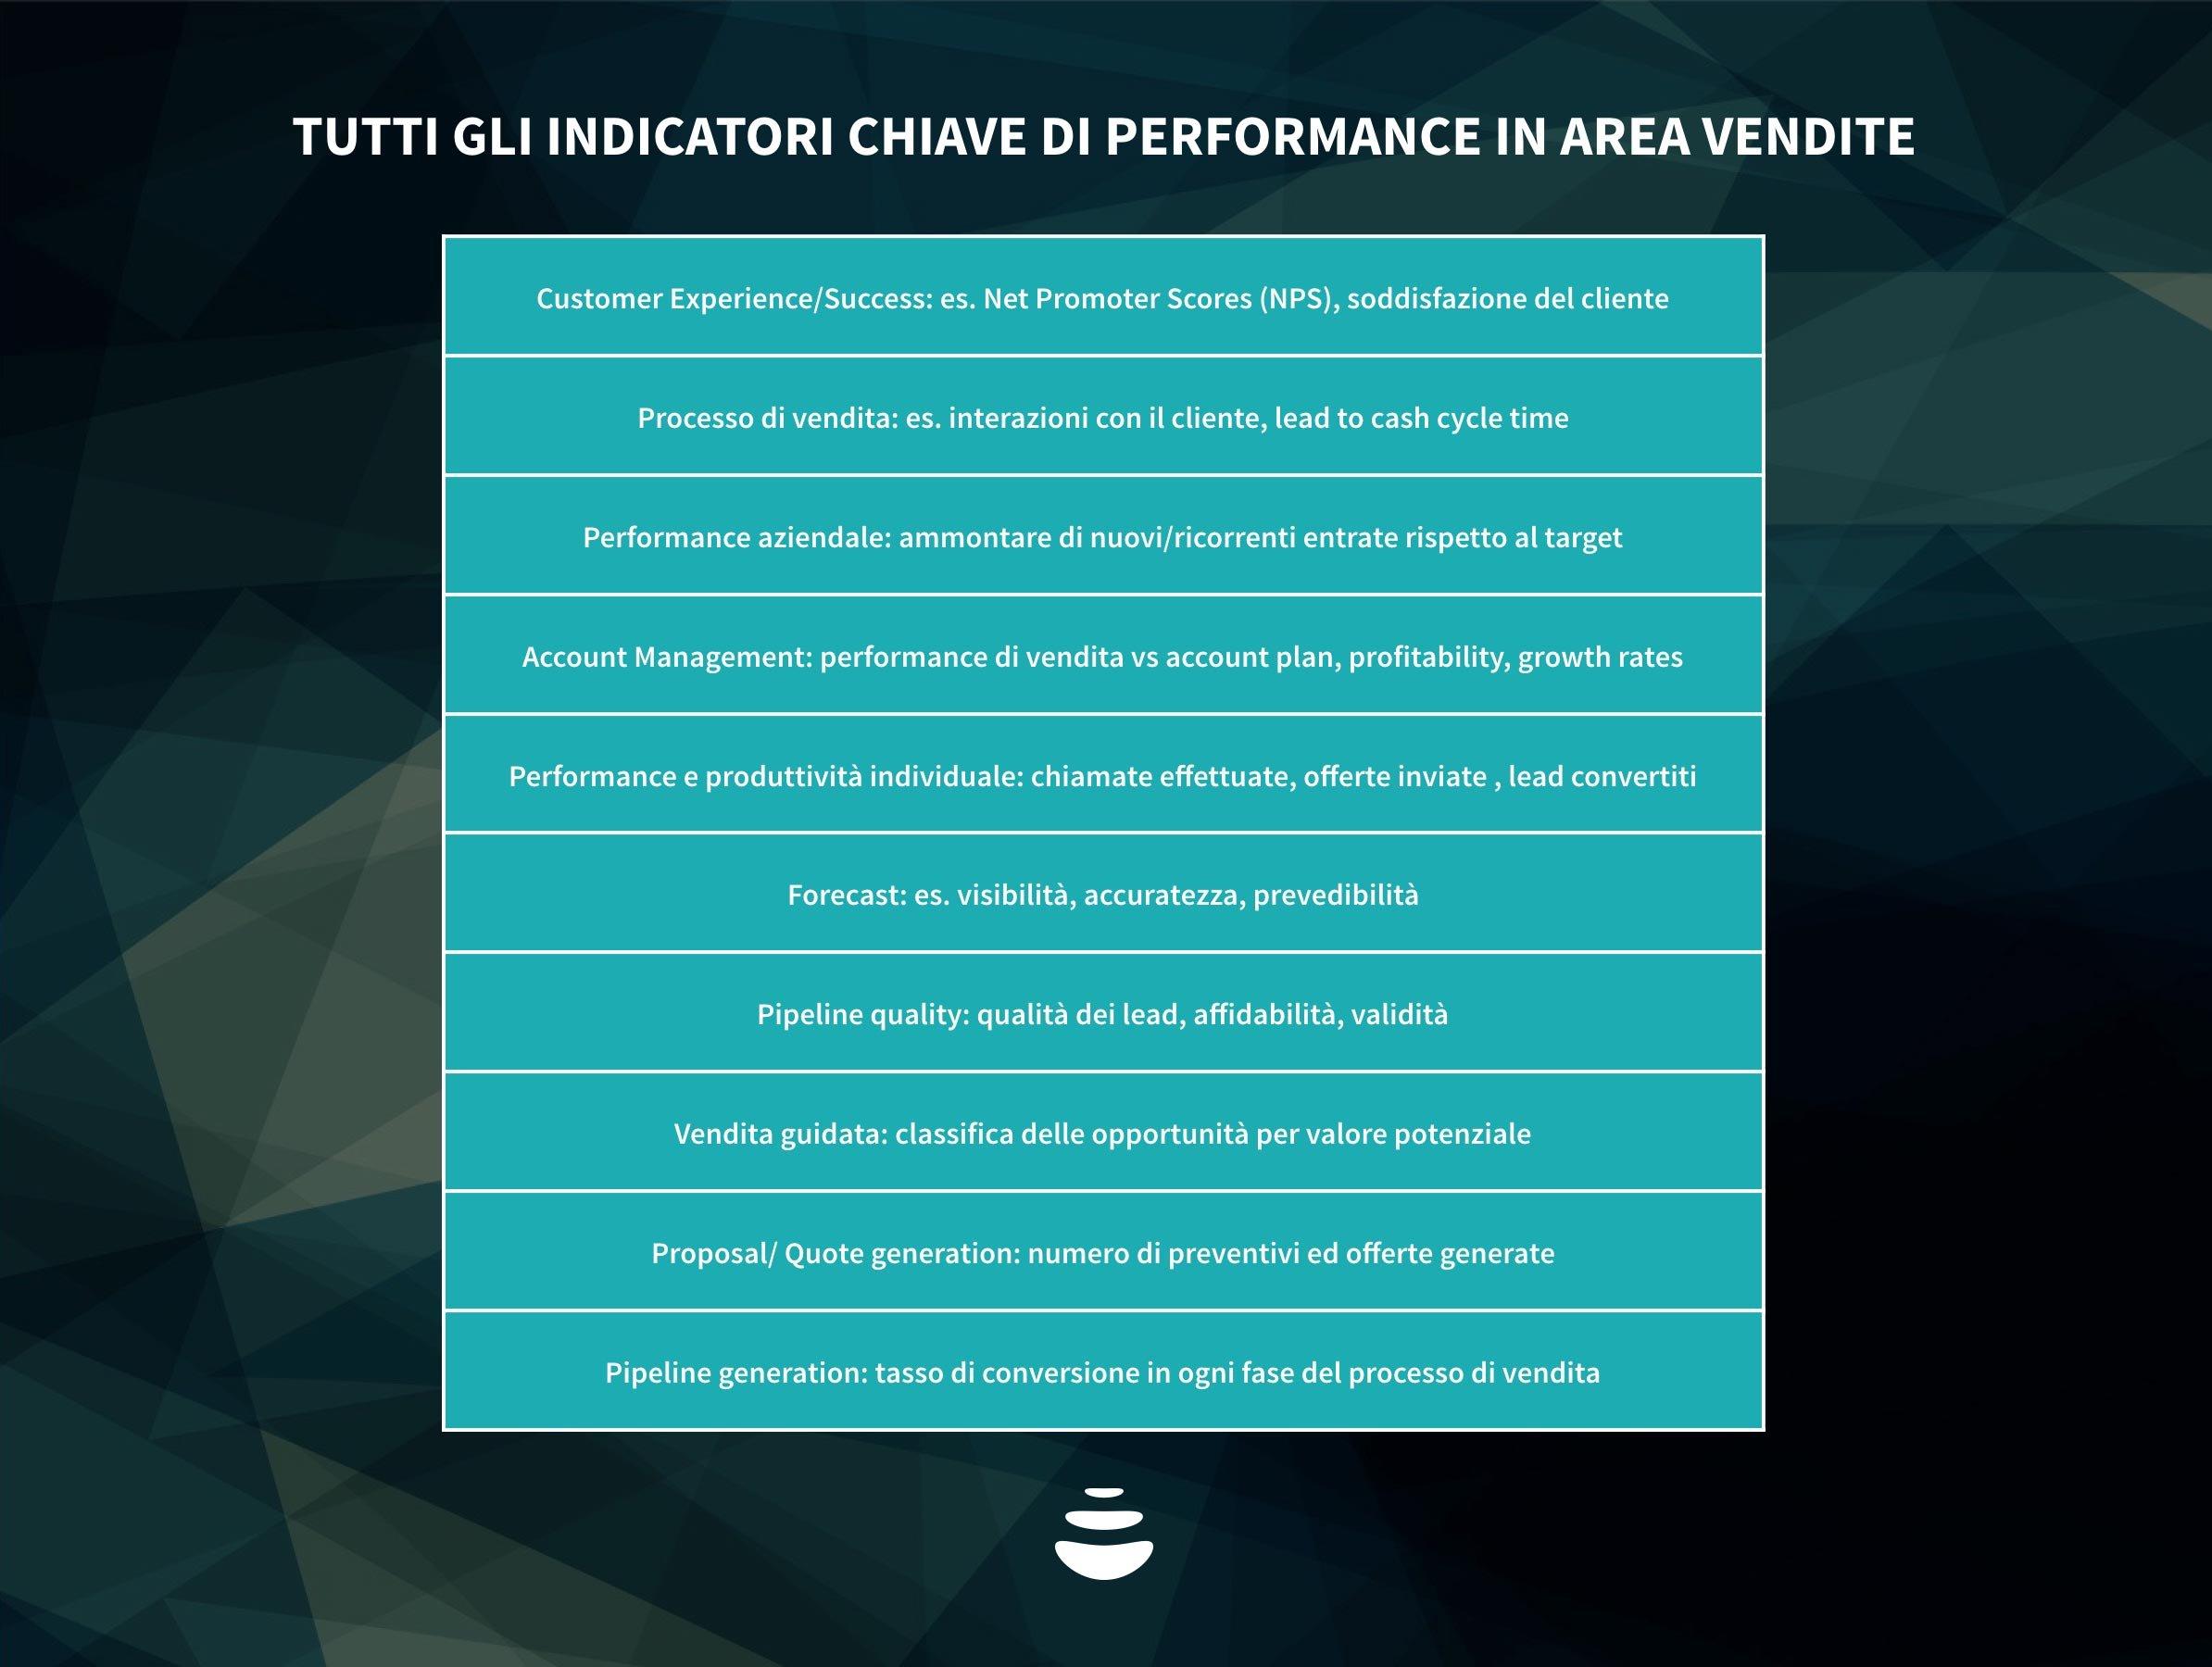 indicatori chiave performance vendite